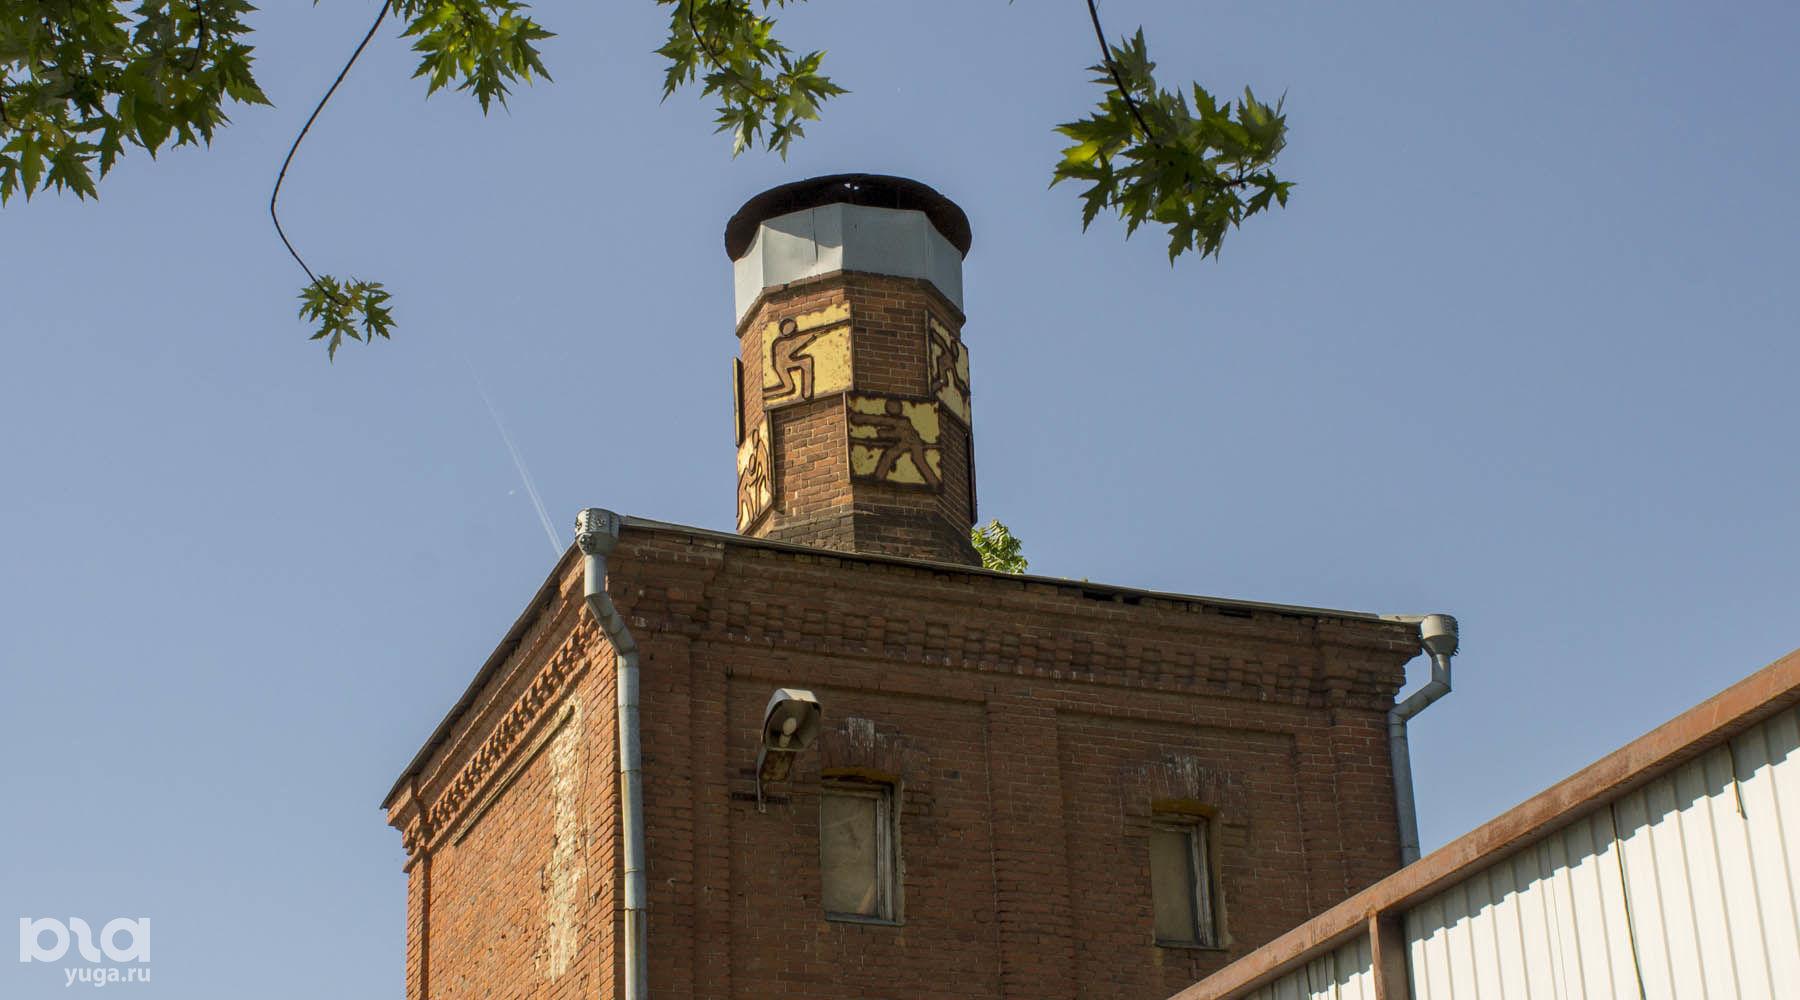 Солодовня пивоварни «Старая Бавария», Ленина, 72 ©Фото Виктора Дерезы, Юга.ру